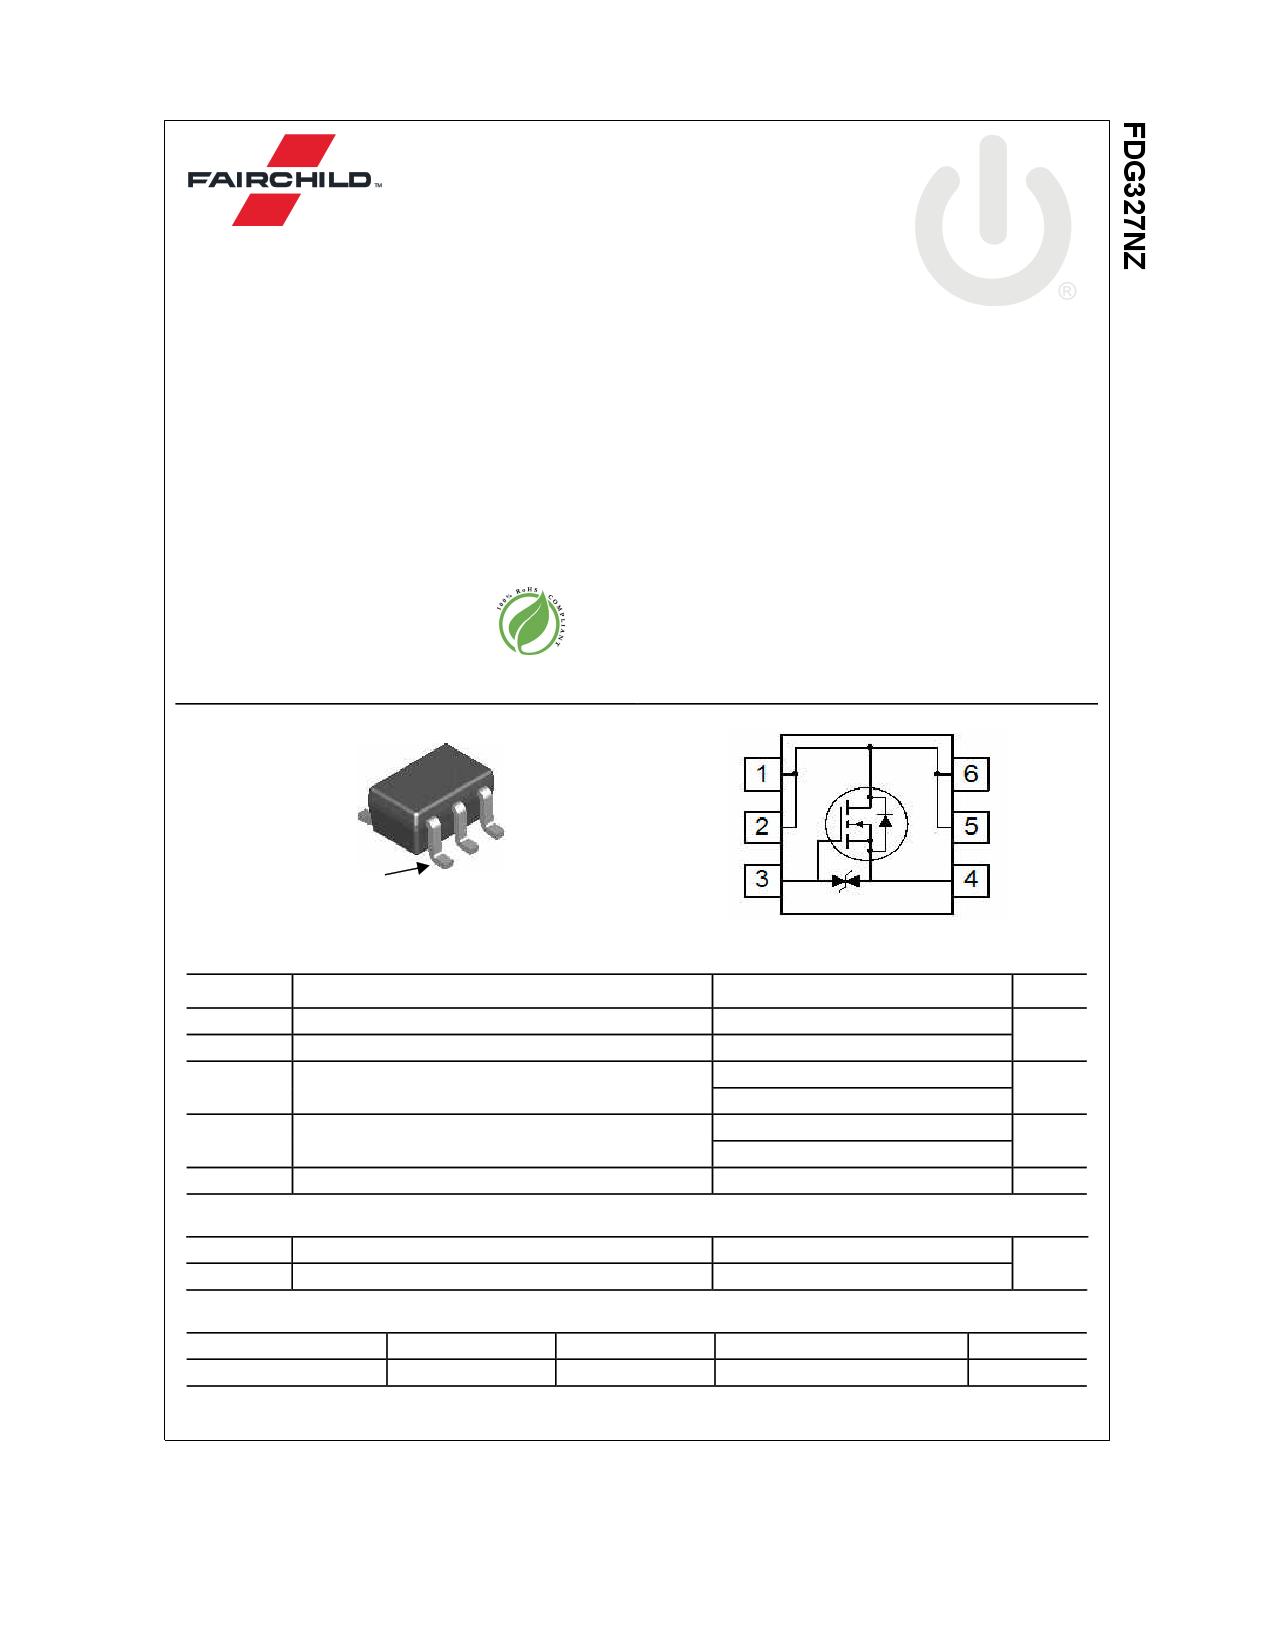 FDG327NZ 데이터시트 및 FDG327NZ PDF